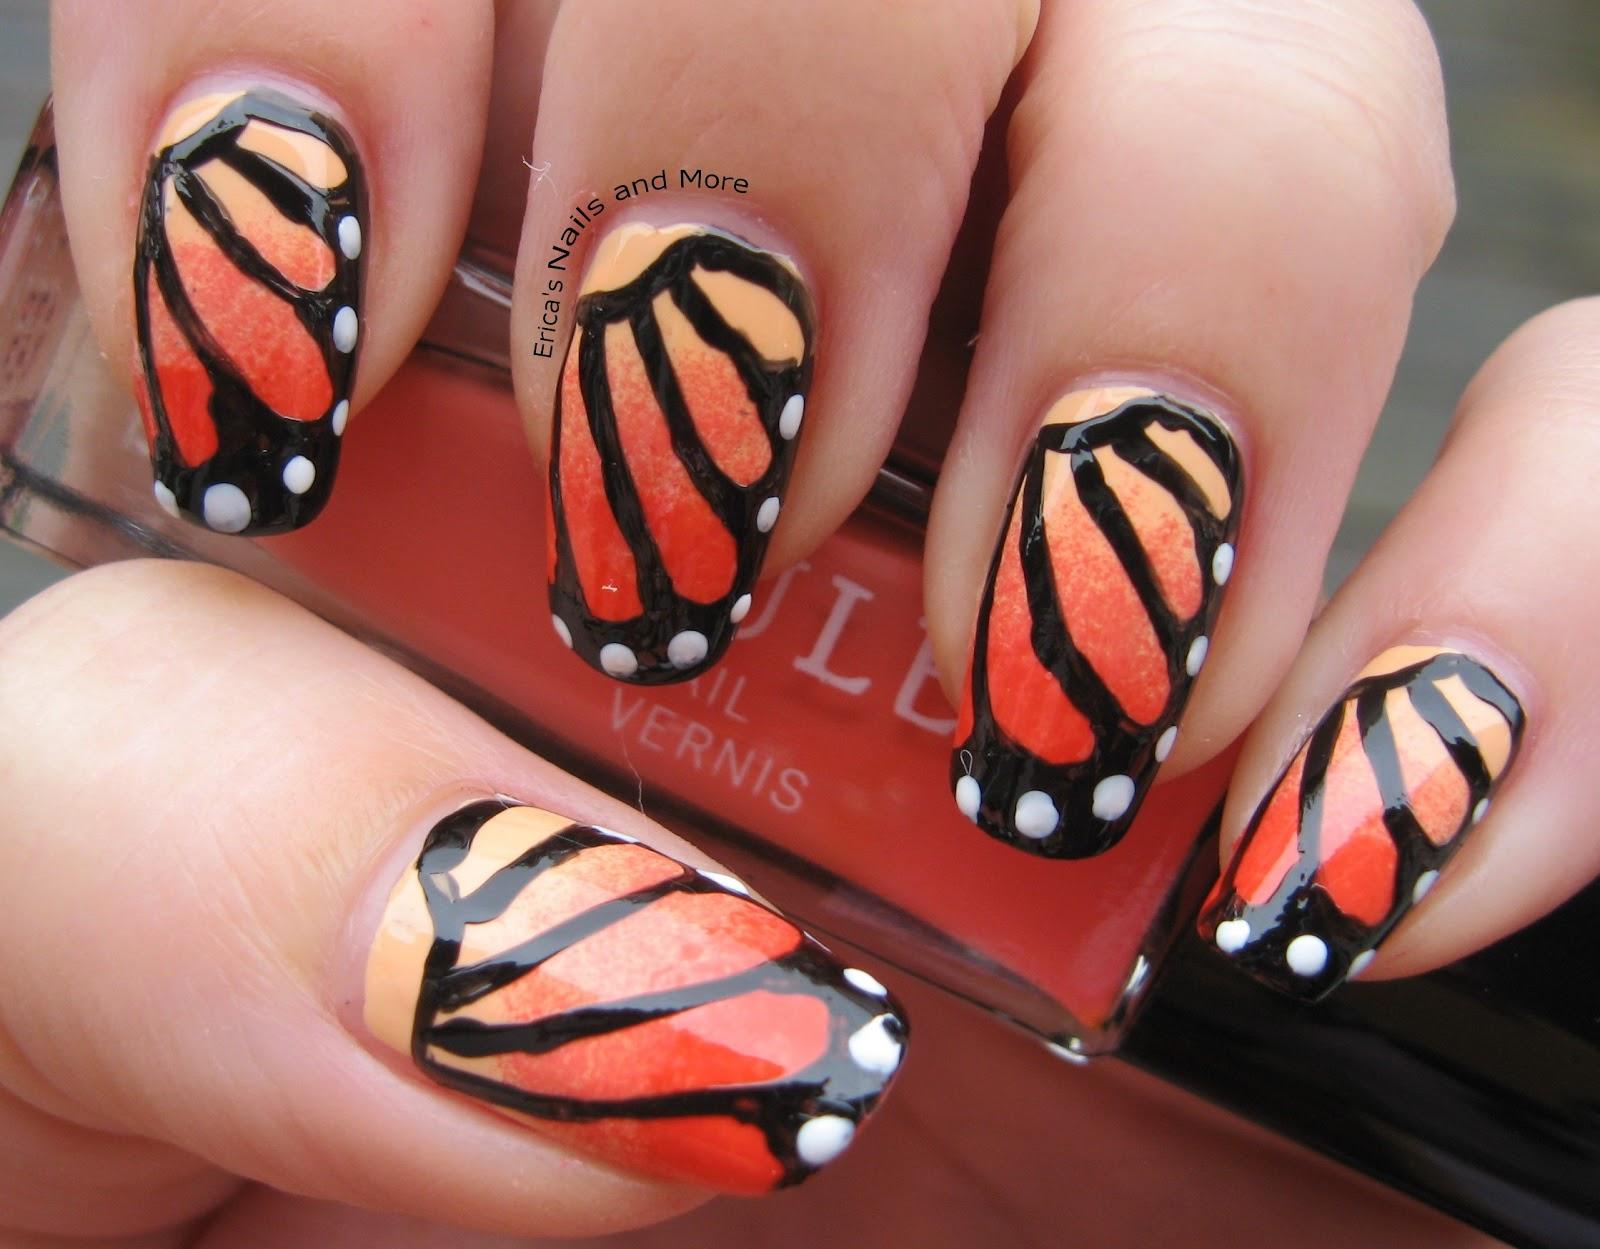 Nail design ideas for